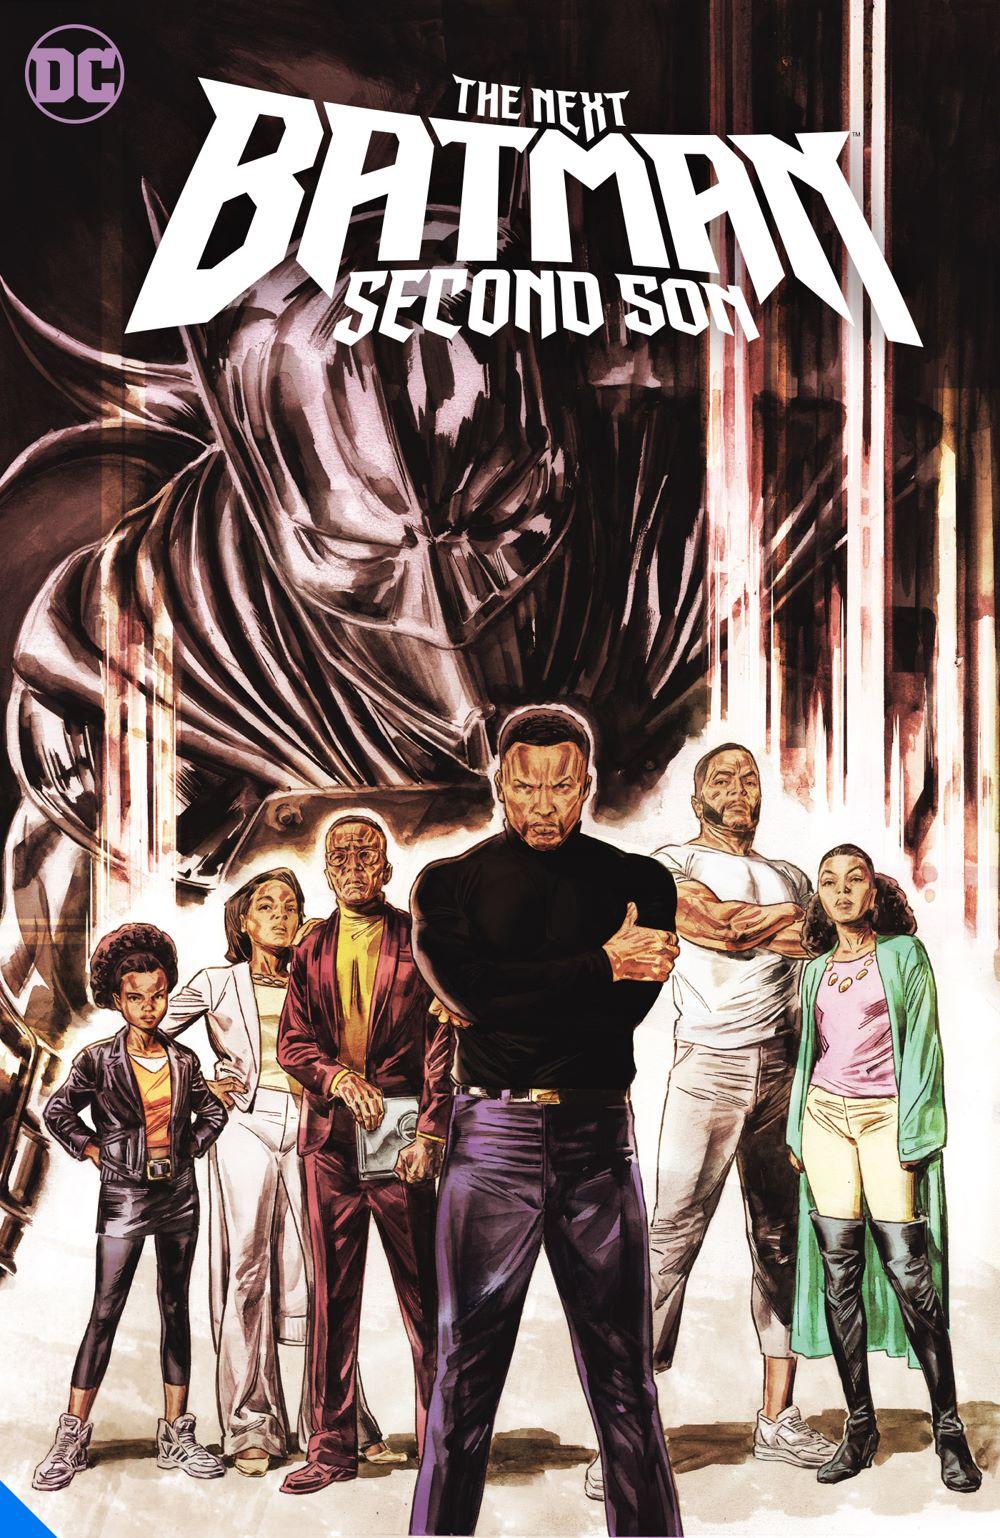 thenextbatmansecondson_adv DC Comics August 2021 Solicitations